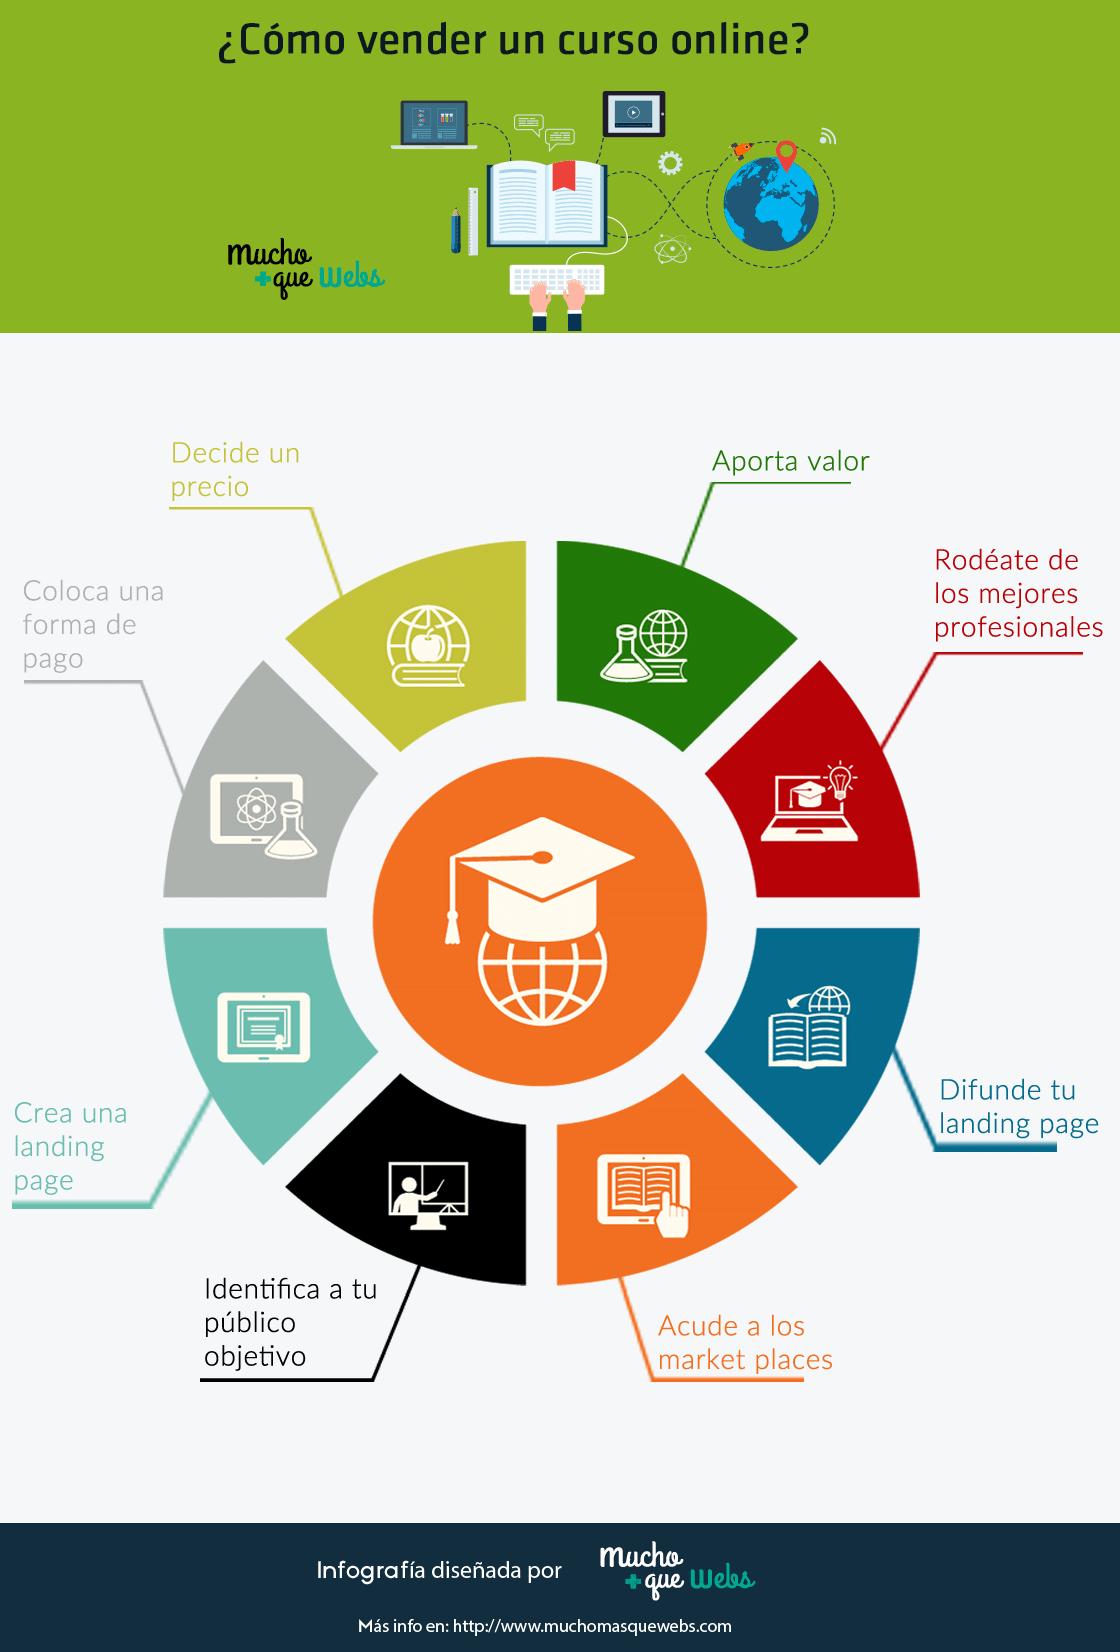 C mo vender un curso online infografia infographic for Curso de interiorismo online